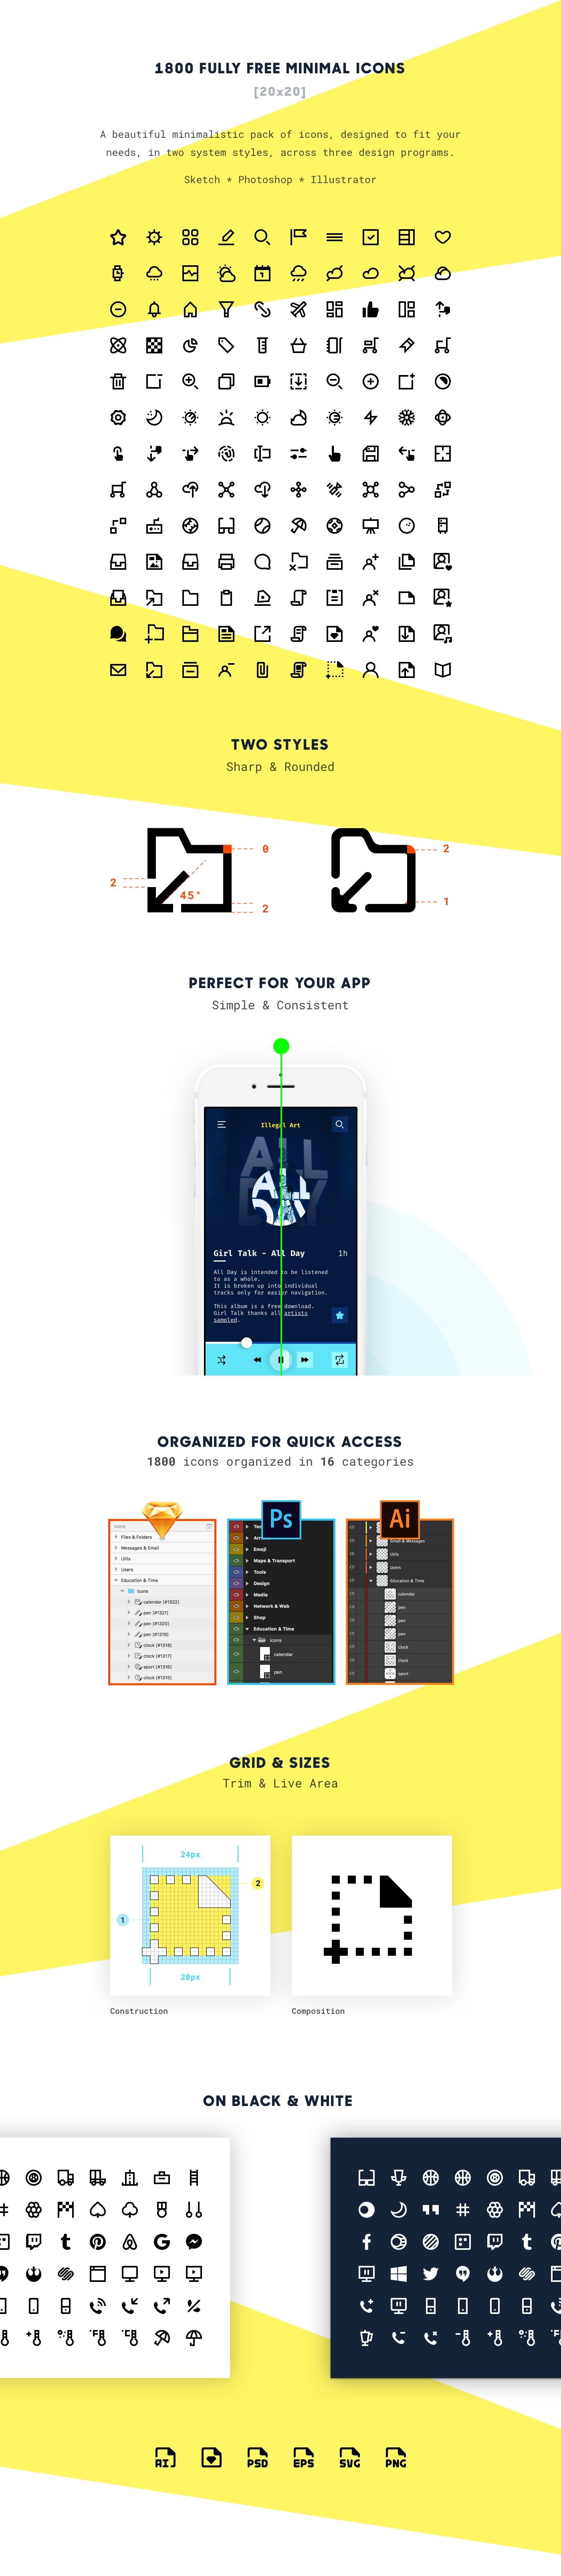 icons free minimal freebie sketch psd ai set Web app